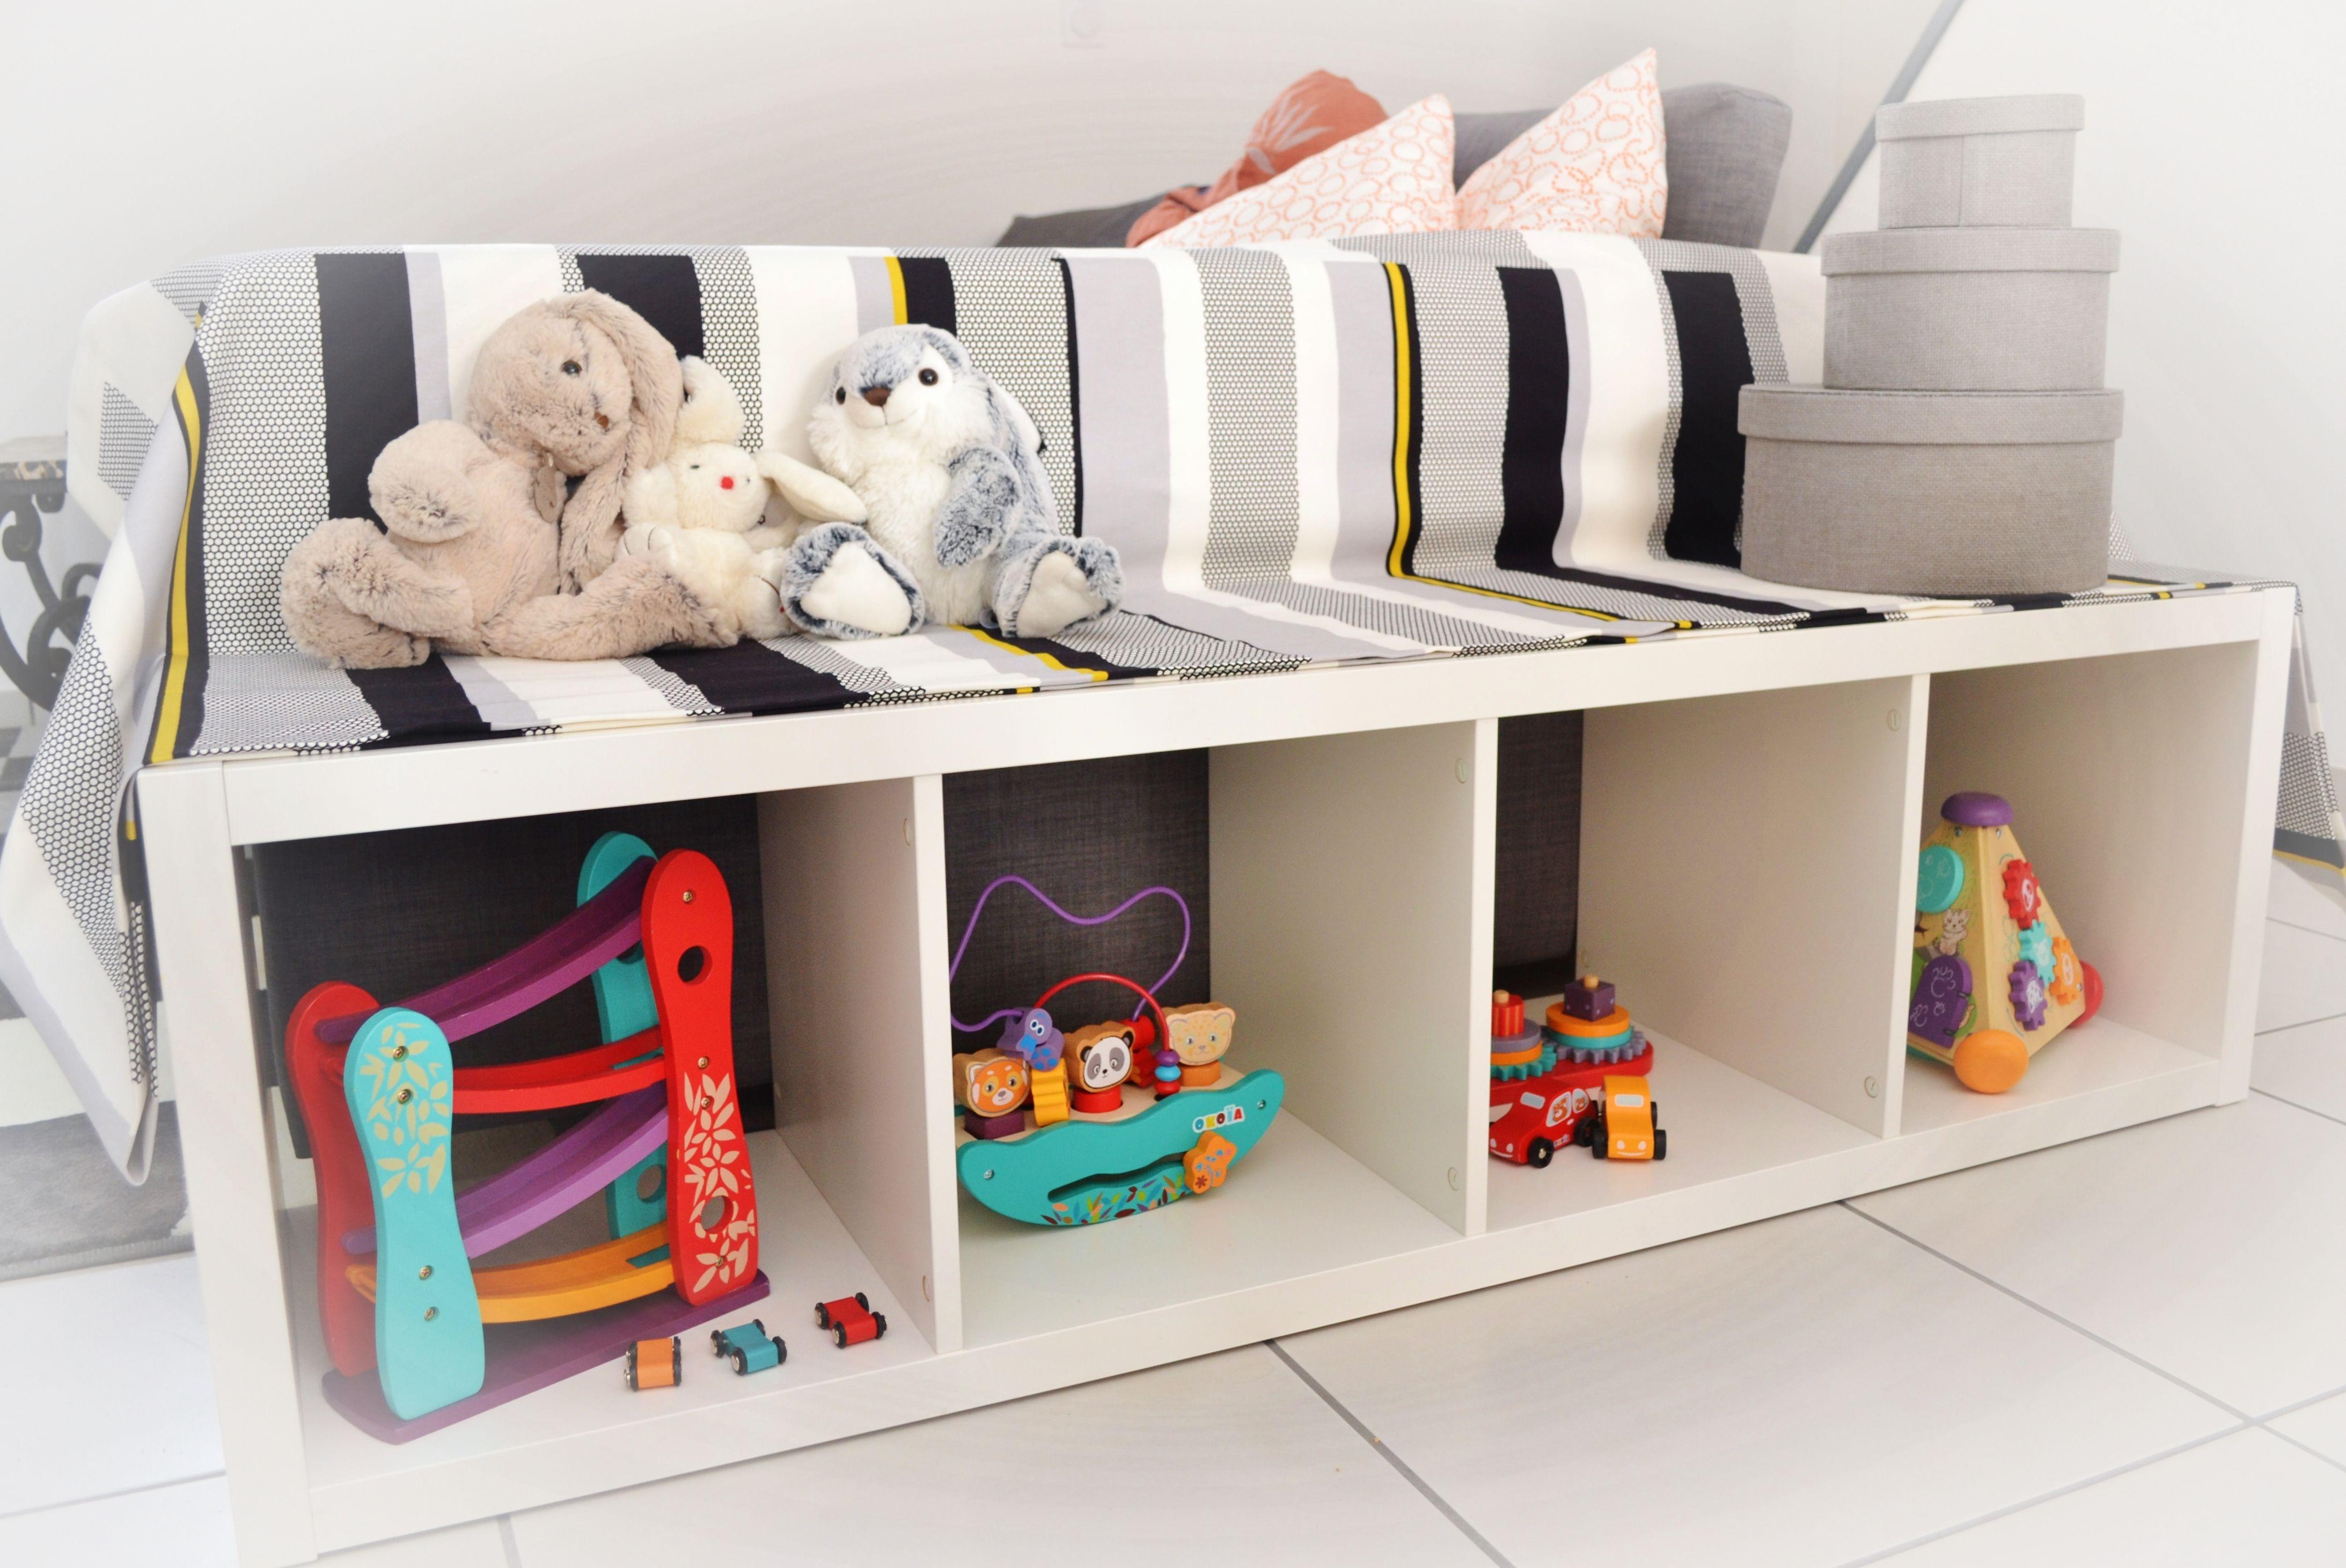 Banquette De Rangement Idees Creatives Diy Home And Deco Idees Creatives